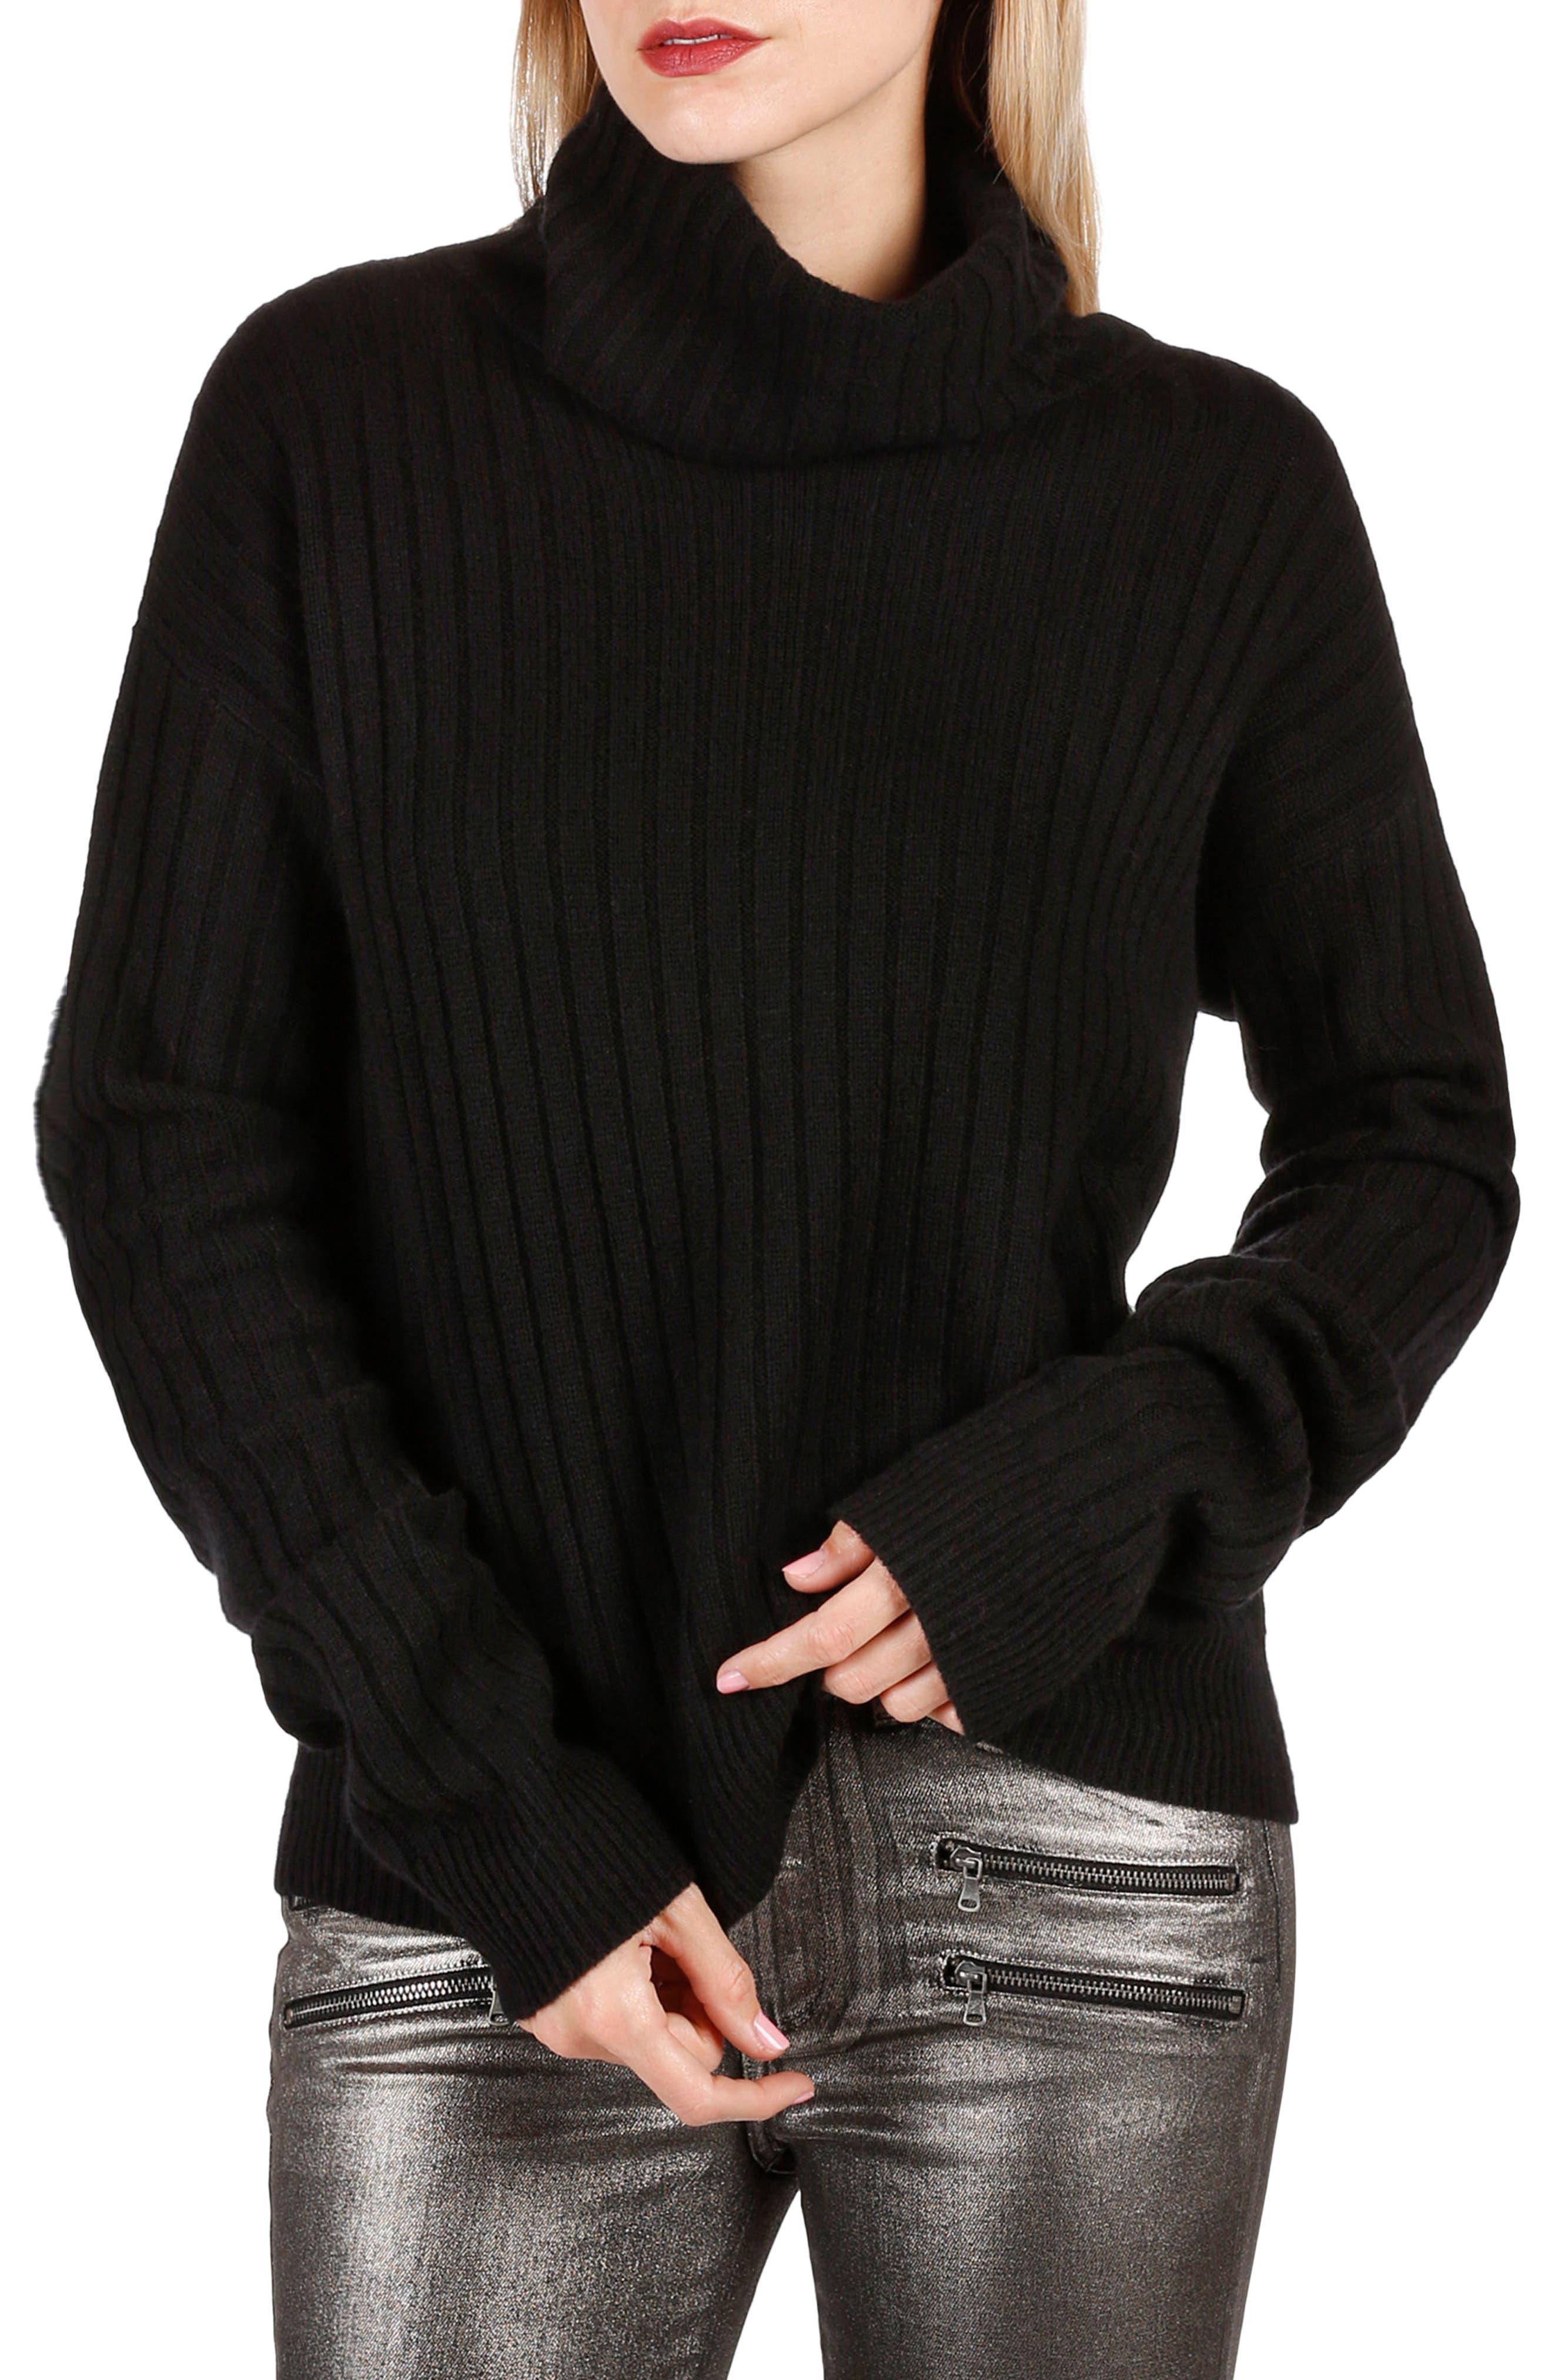 Rosie HW x PAIGE Mina Turtleneck Sweater,                             Main thumbnail 1, color,                             001